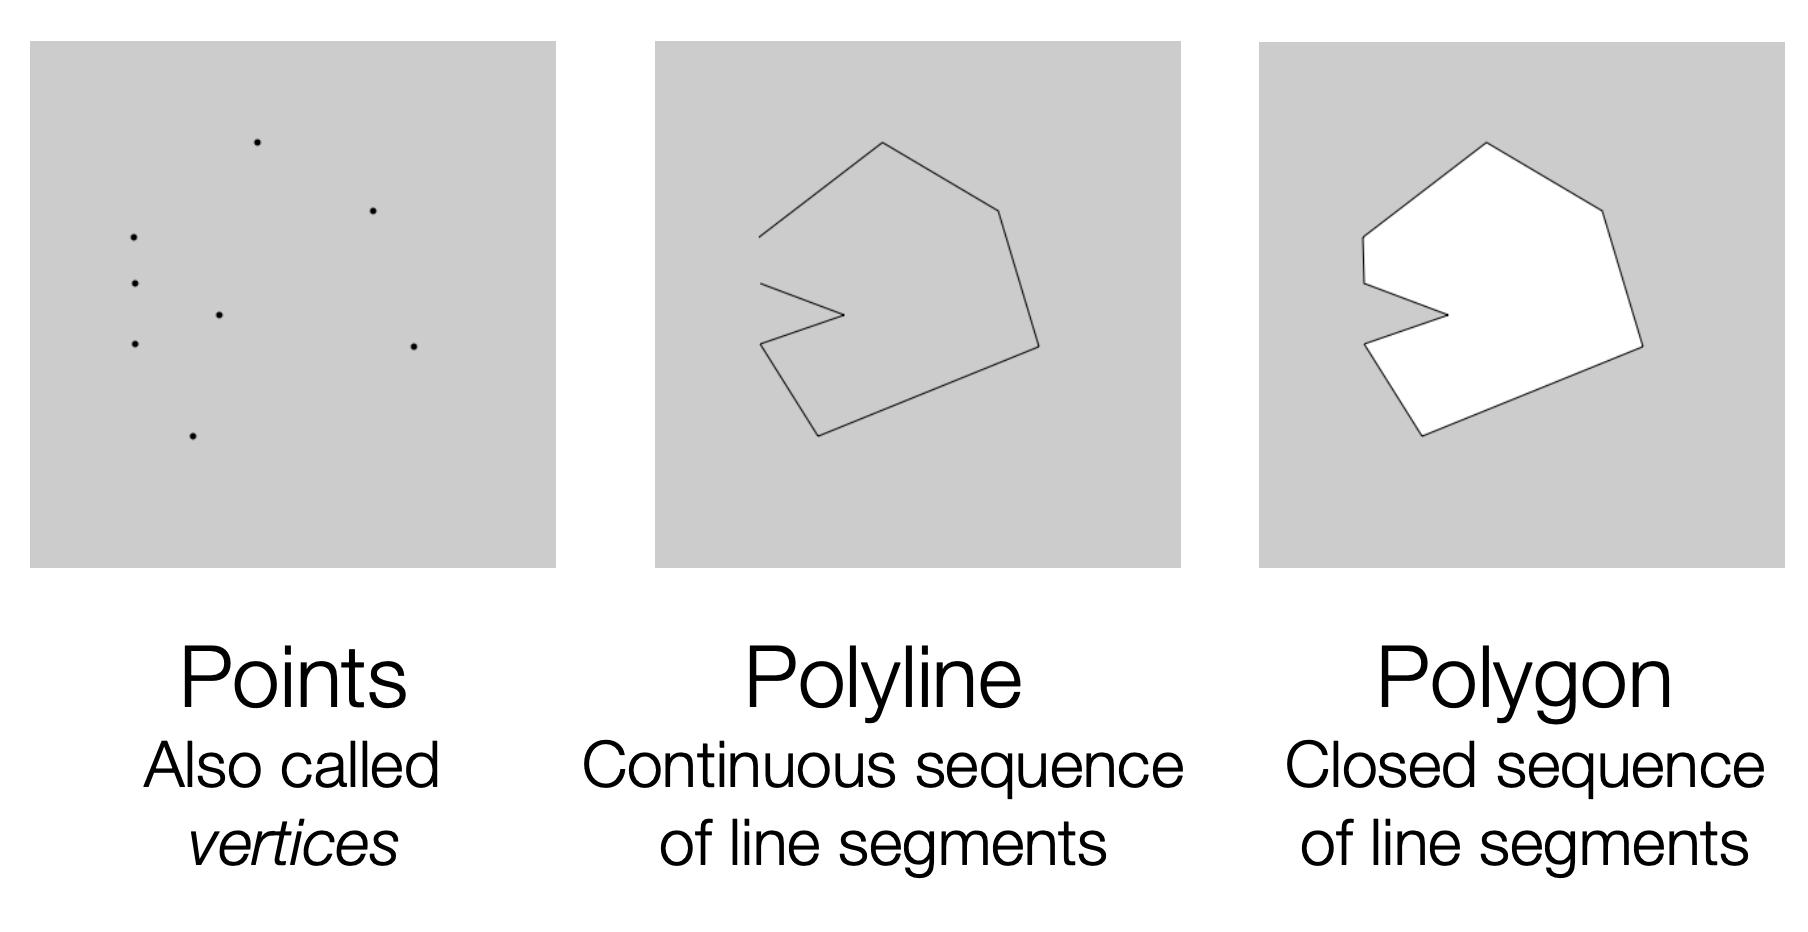 https://www.cs.umd.edu/~reastman/slides/L02P01PolylinesAndPolygons.pdf